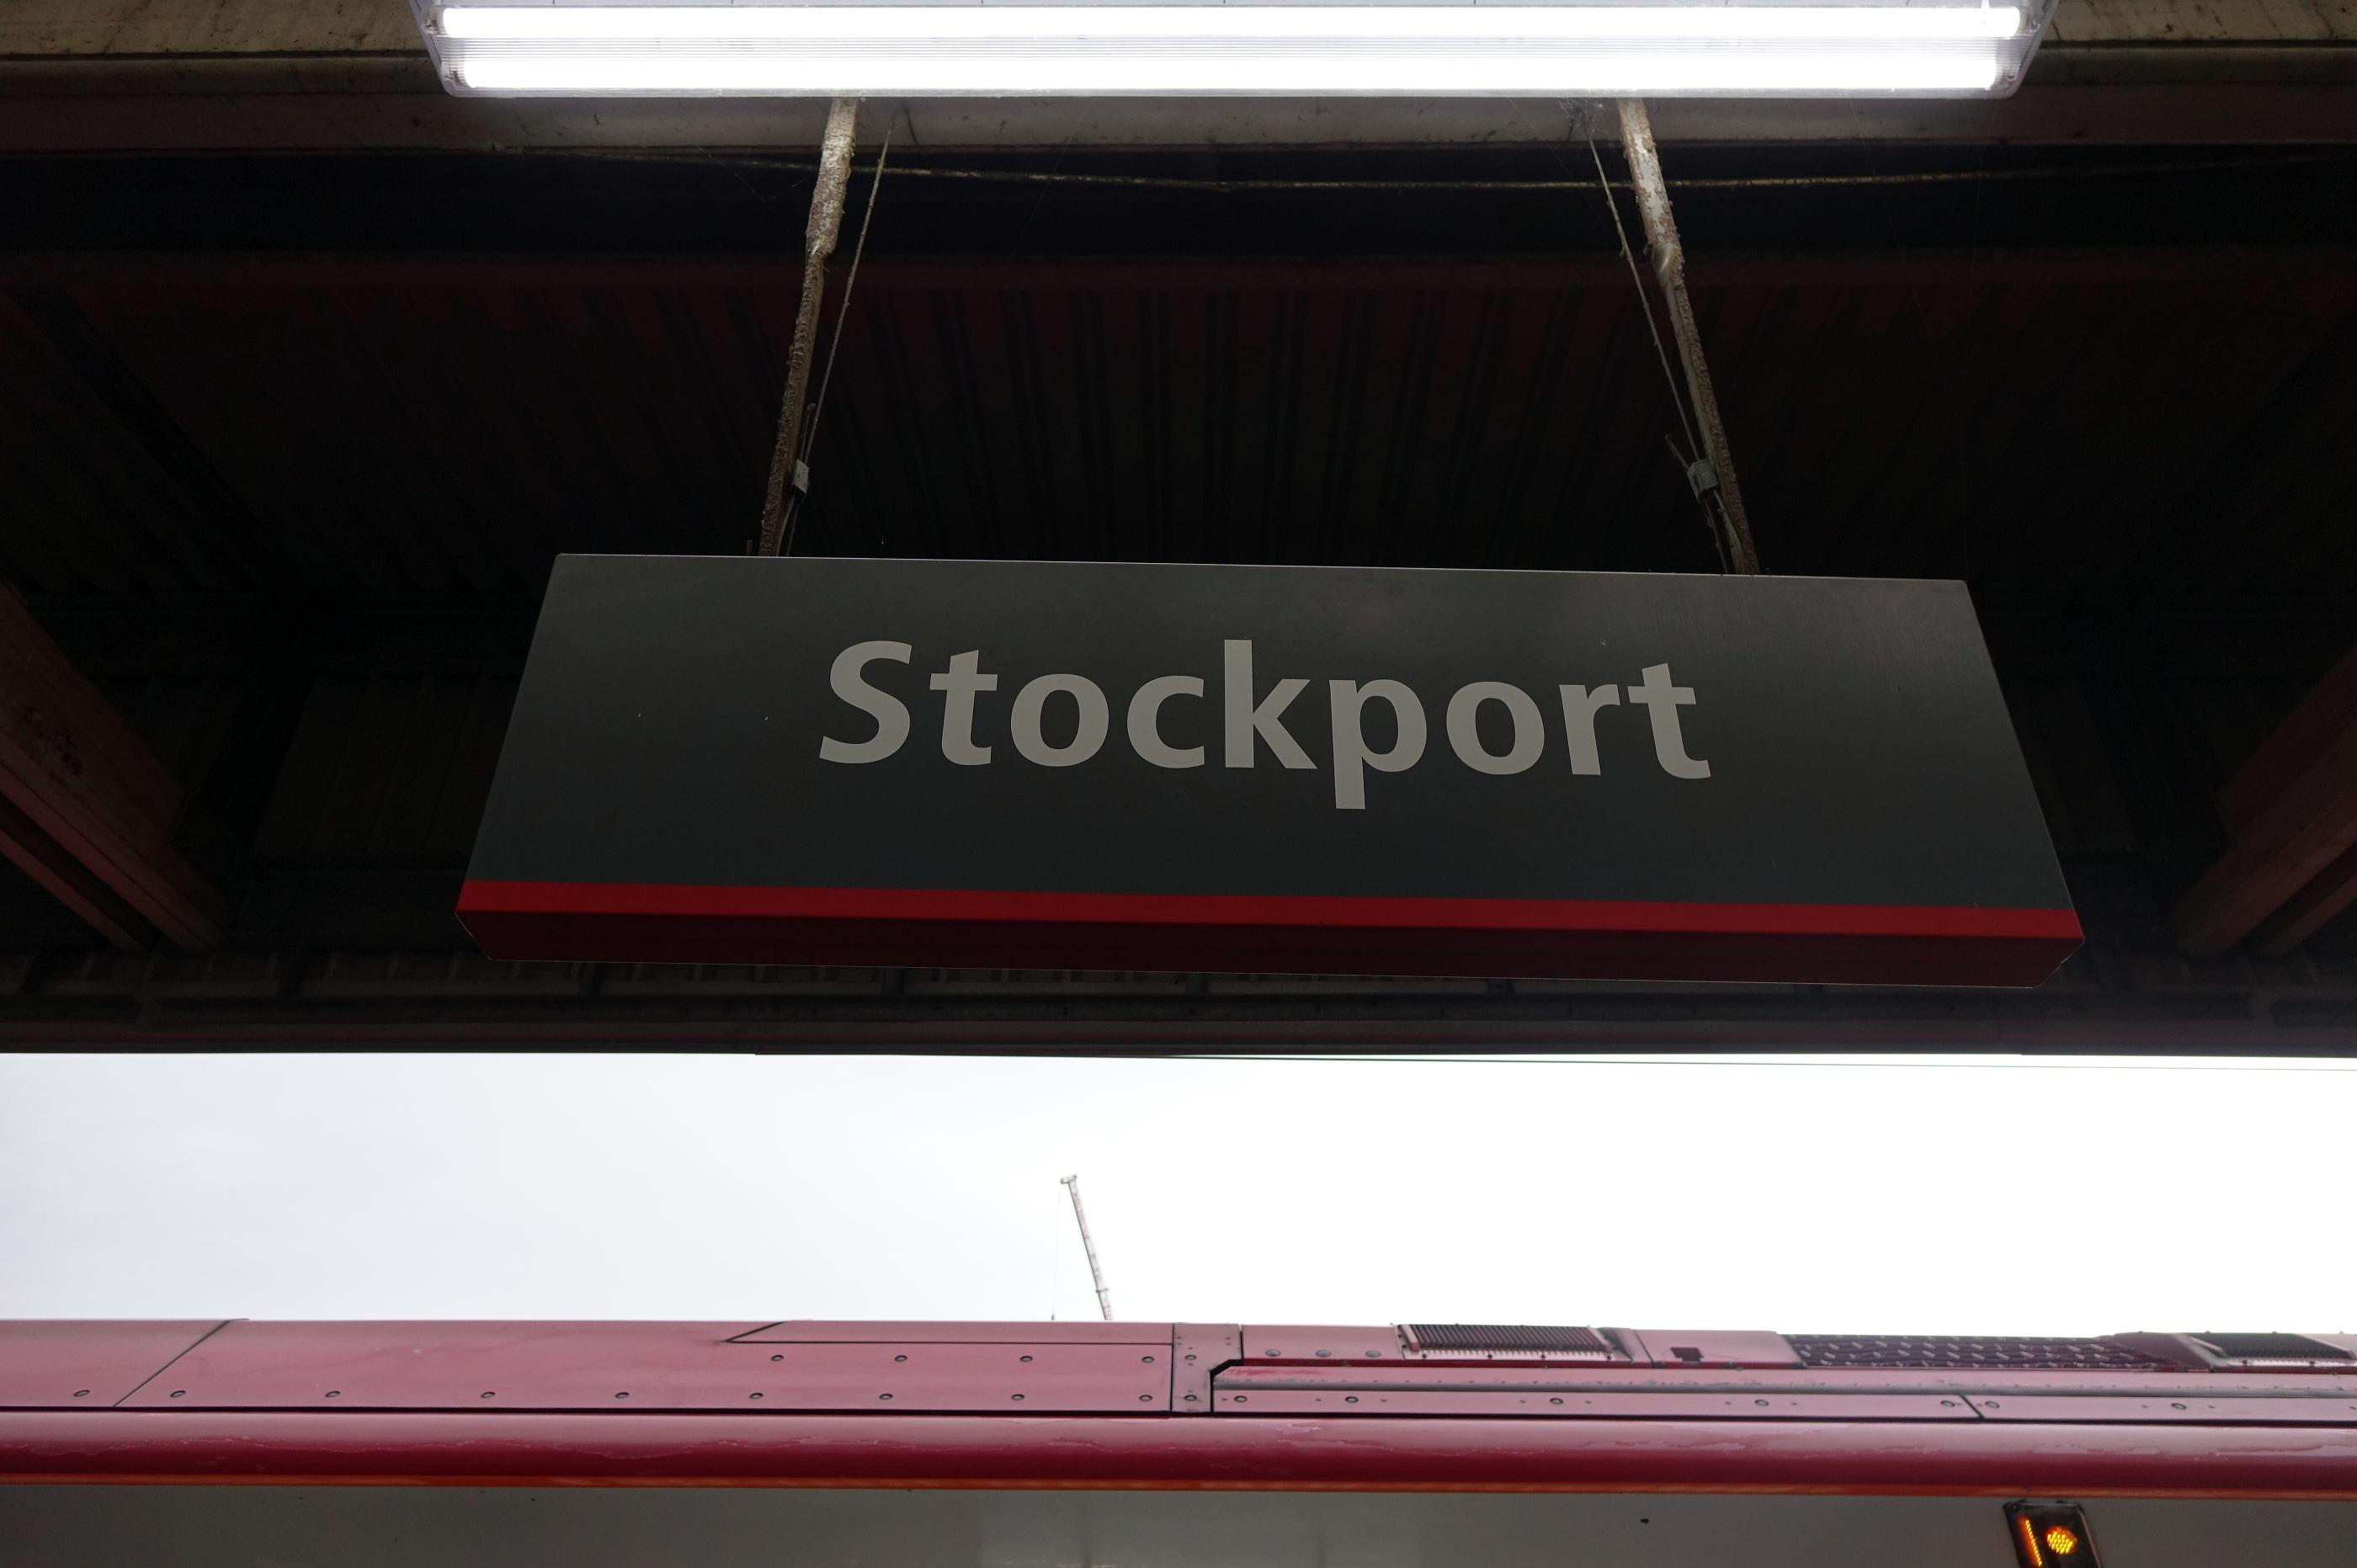 Stockport  駅sigh